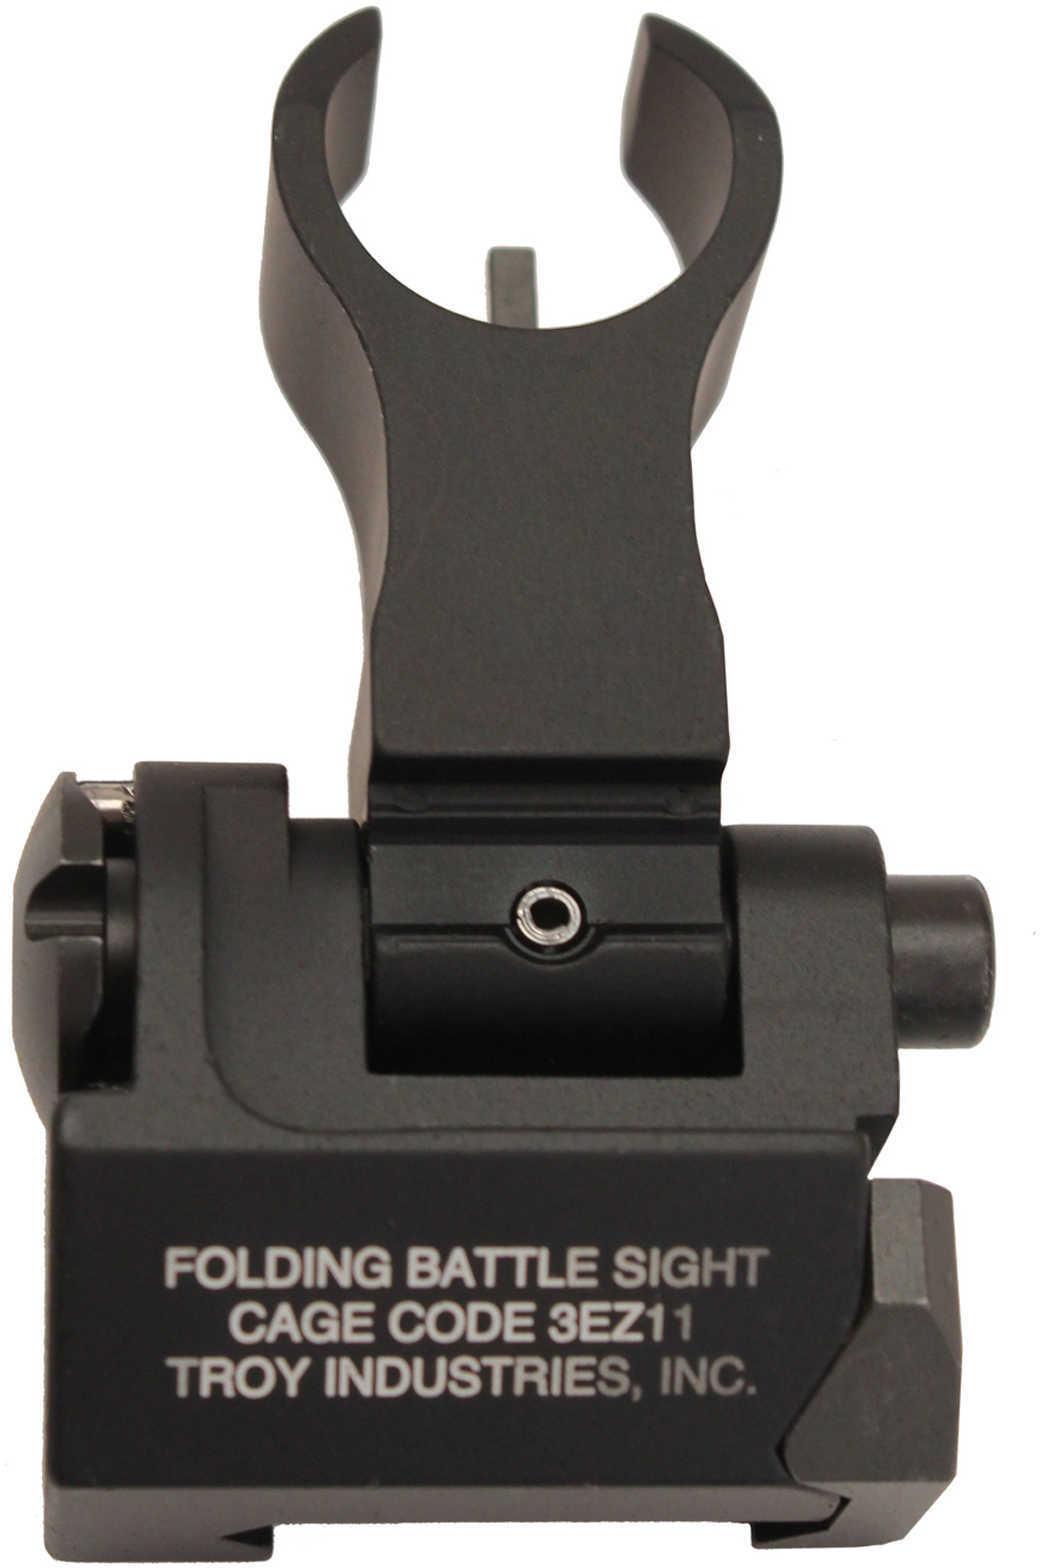 Troy BattleSight Folding Front Sight HK style Picatinny Black SSIG-FBS-FHBT-00